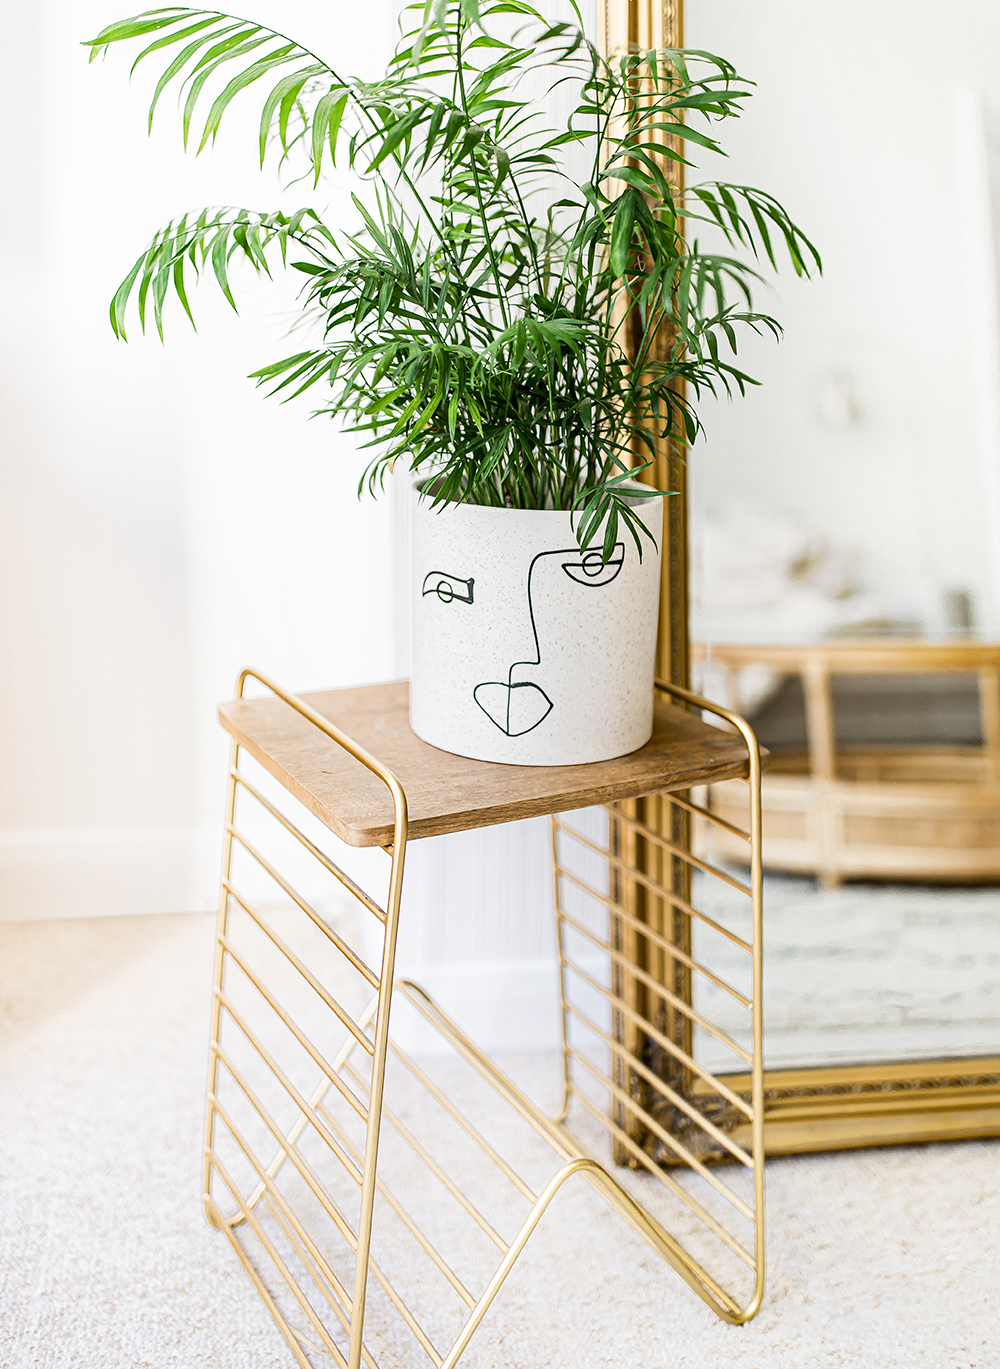 Parlour-Palm-Chamaedorea-elegans-scandens-kelseyinlondon-homewithkelsey-plant-guide-best-indoor-plants